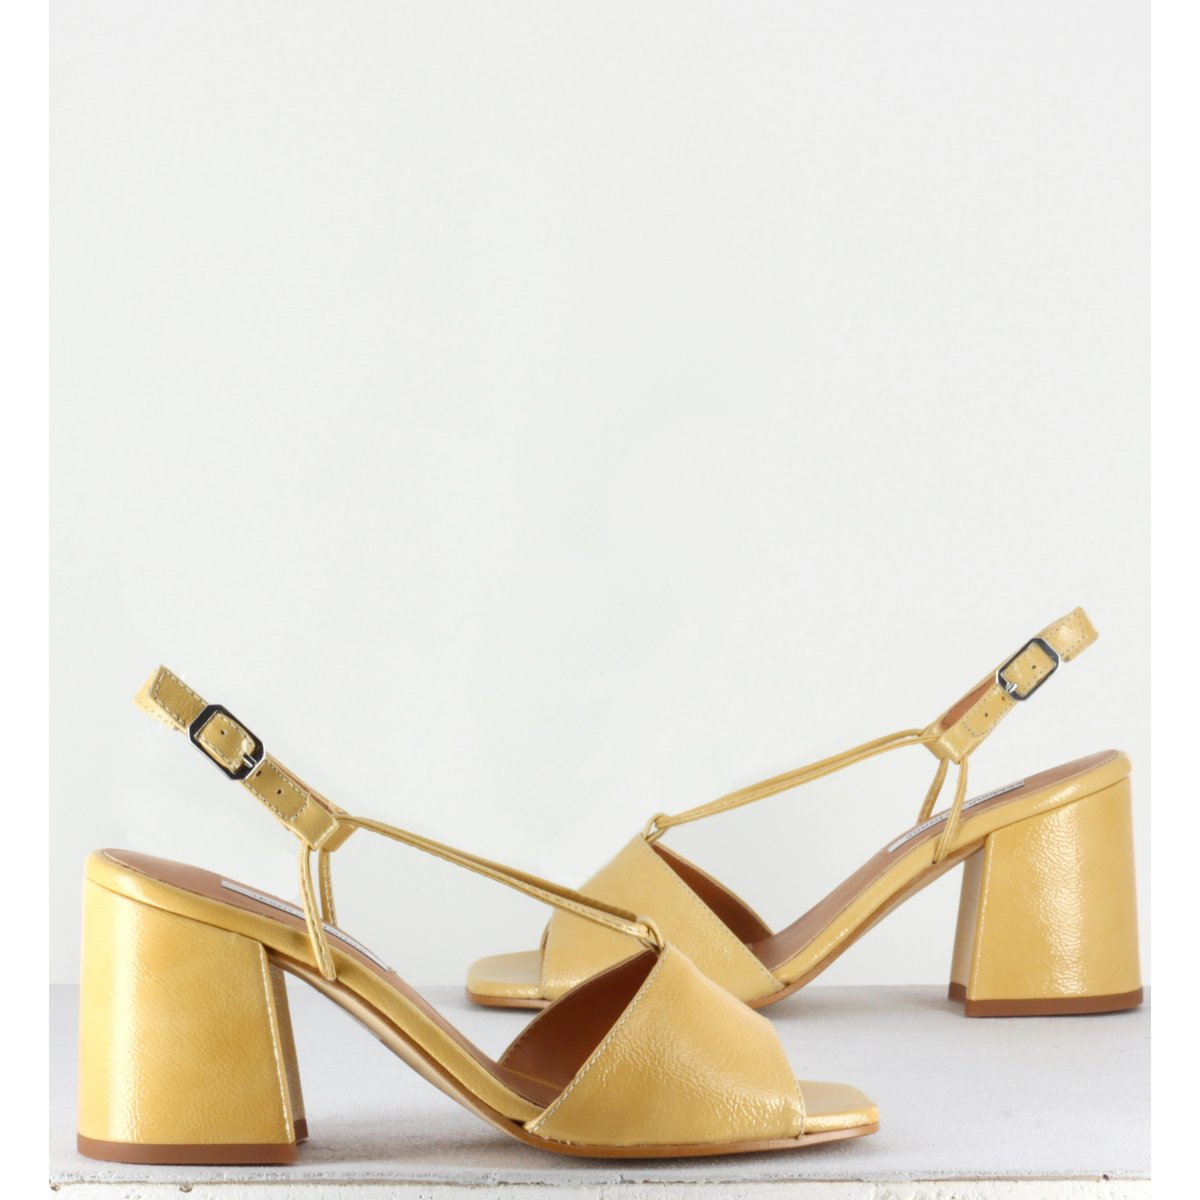 Sandales en cuir jaune - Sarah sand